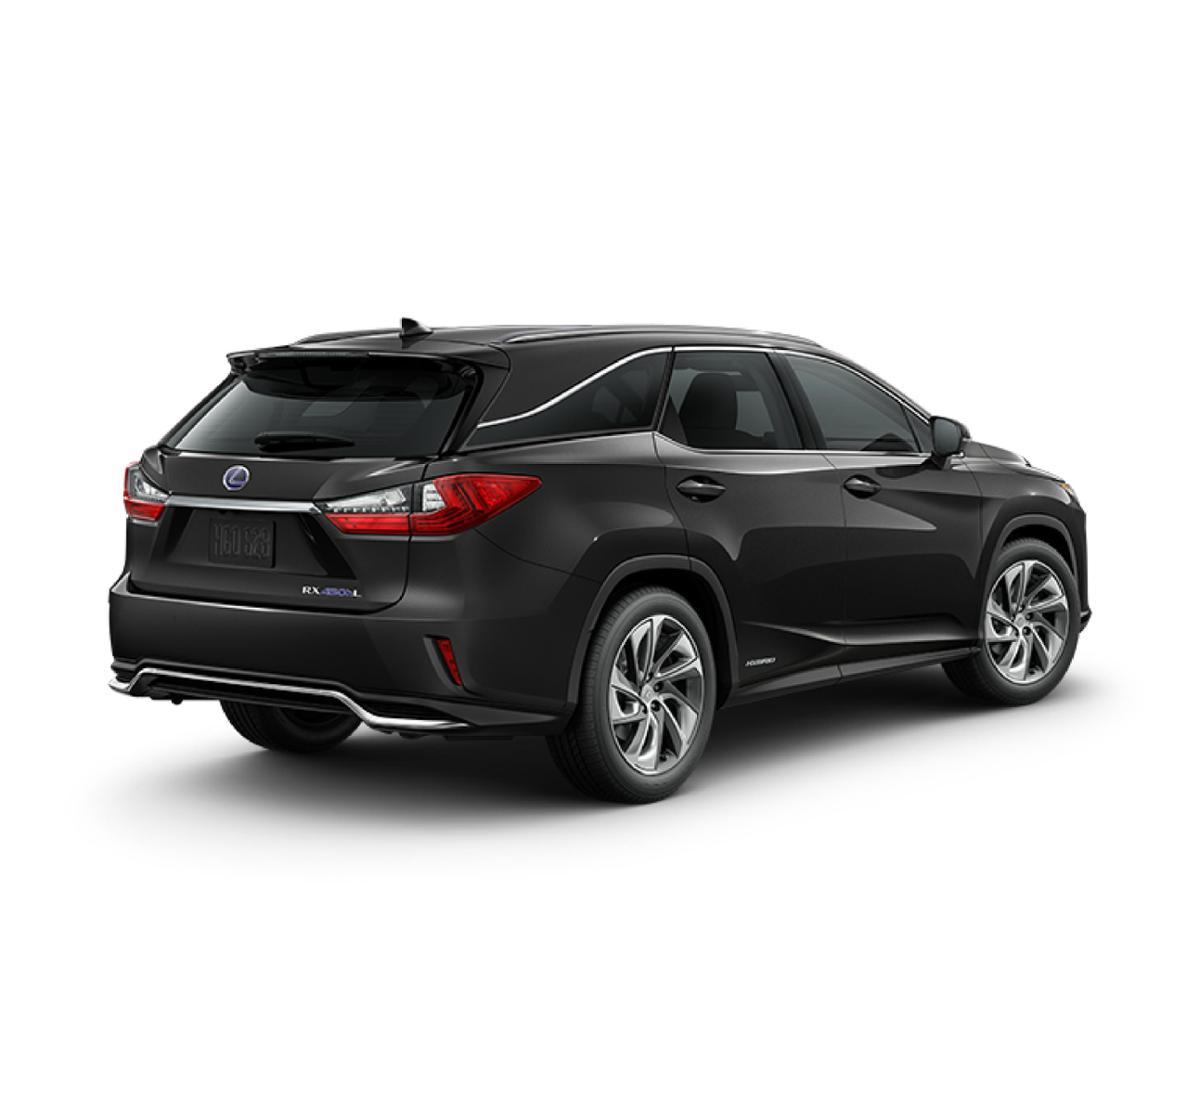 Lexus Dealerships In Ct: New 2019 Lexus RX 450hL Luxury At Lexus Of Watertown, Your